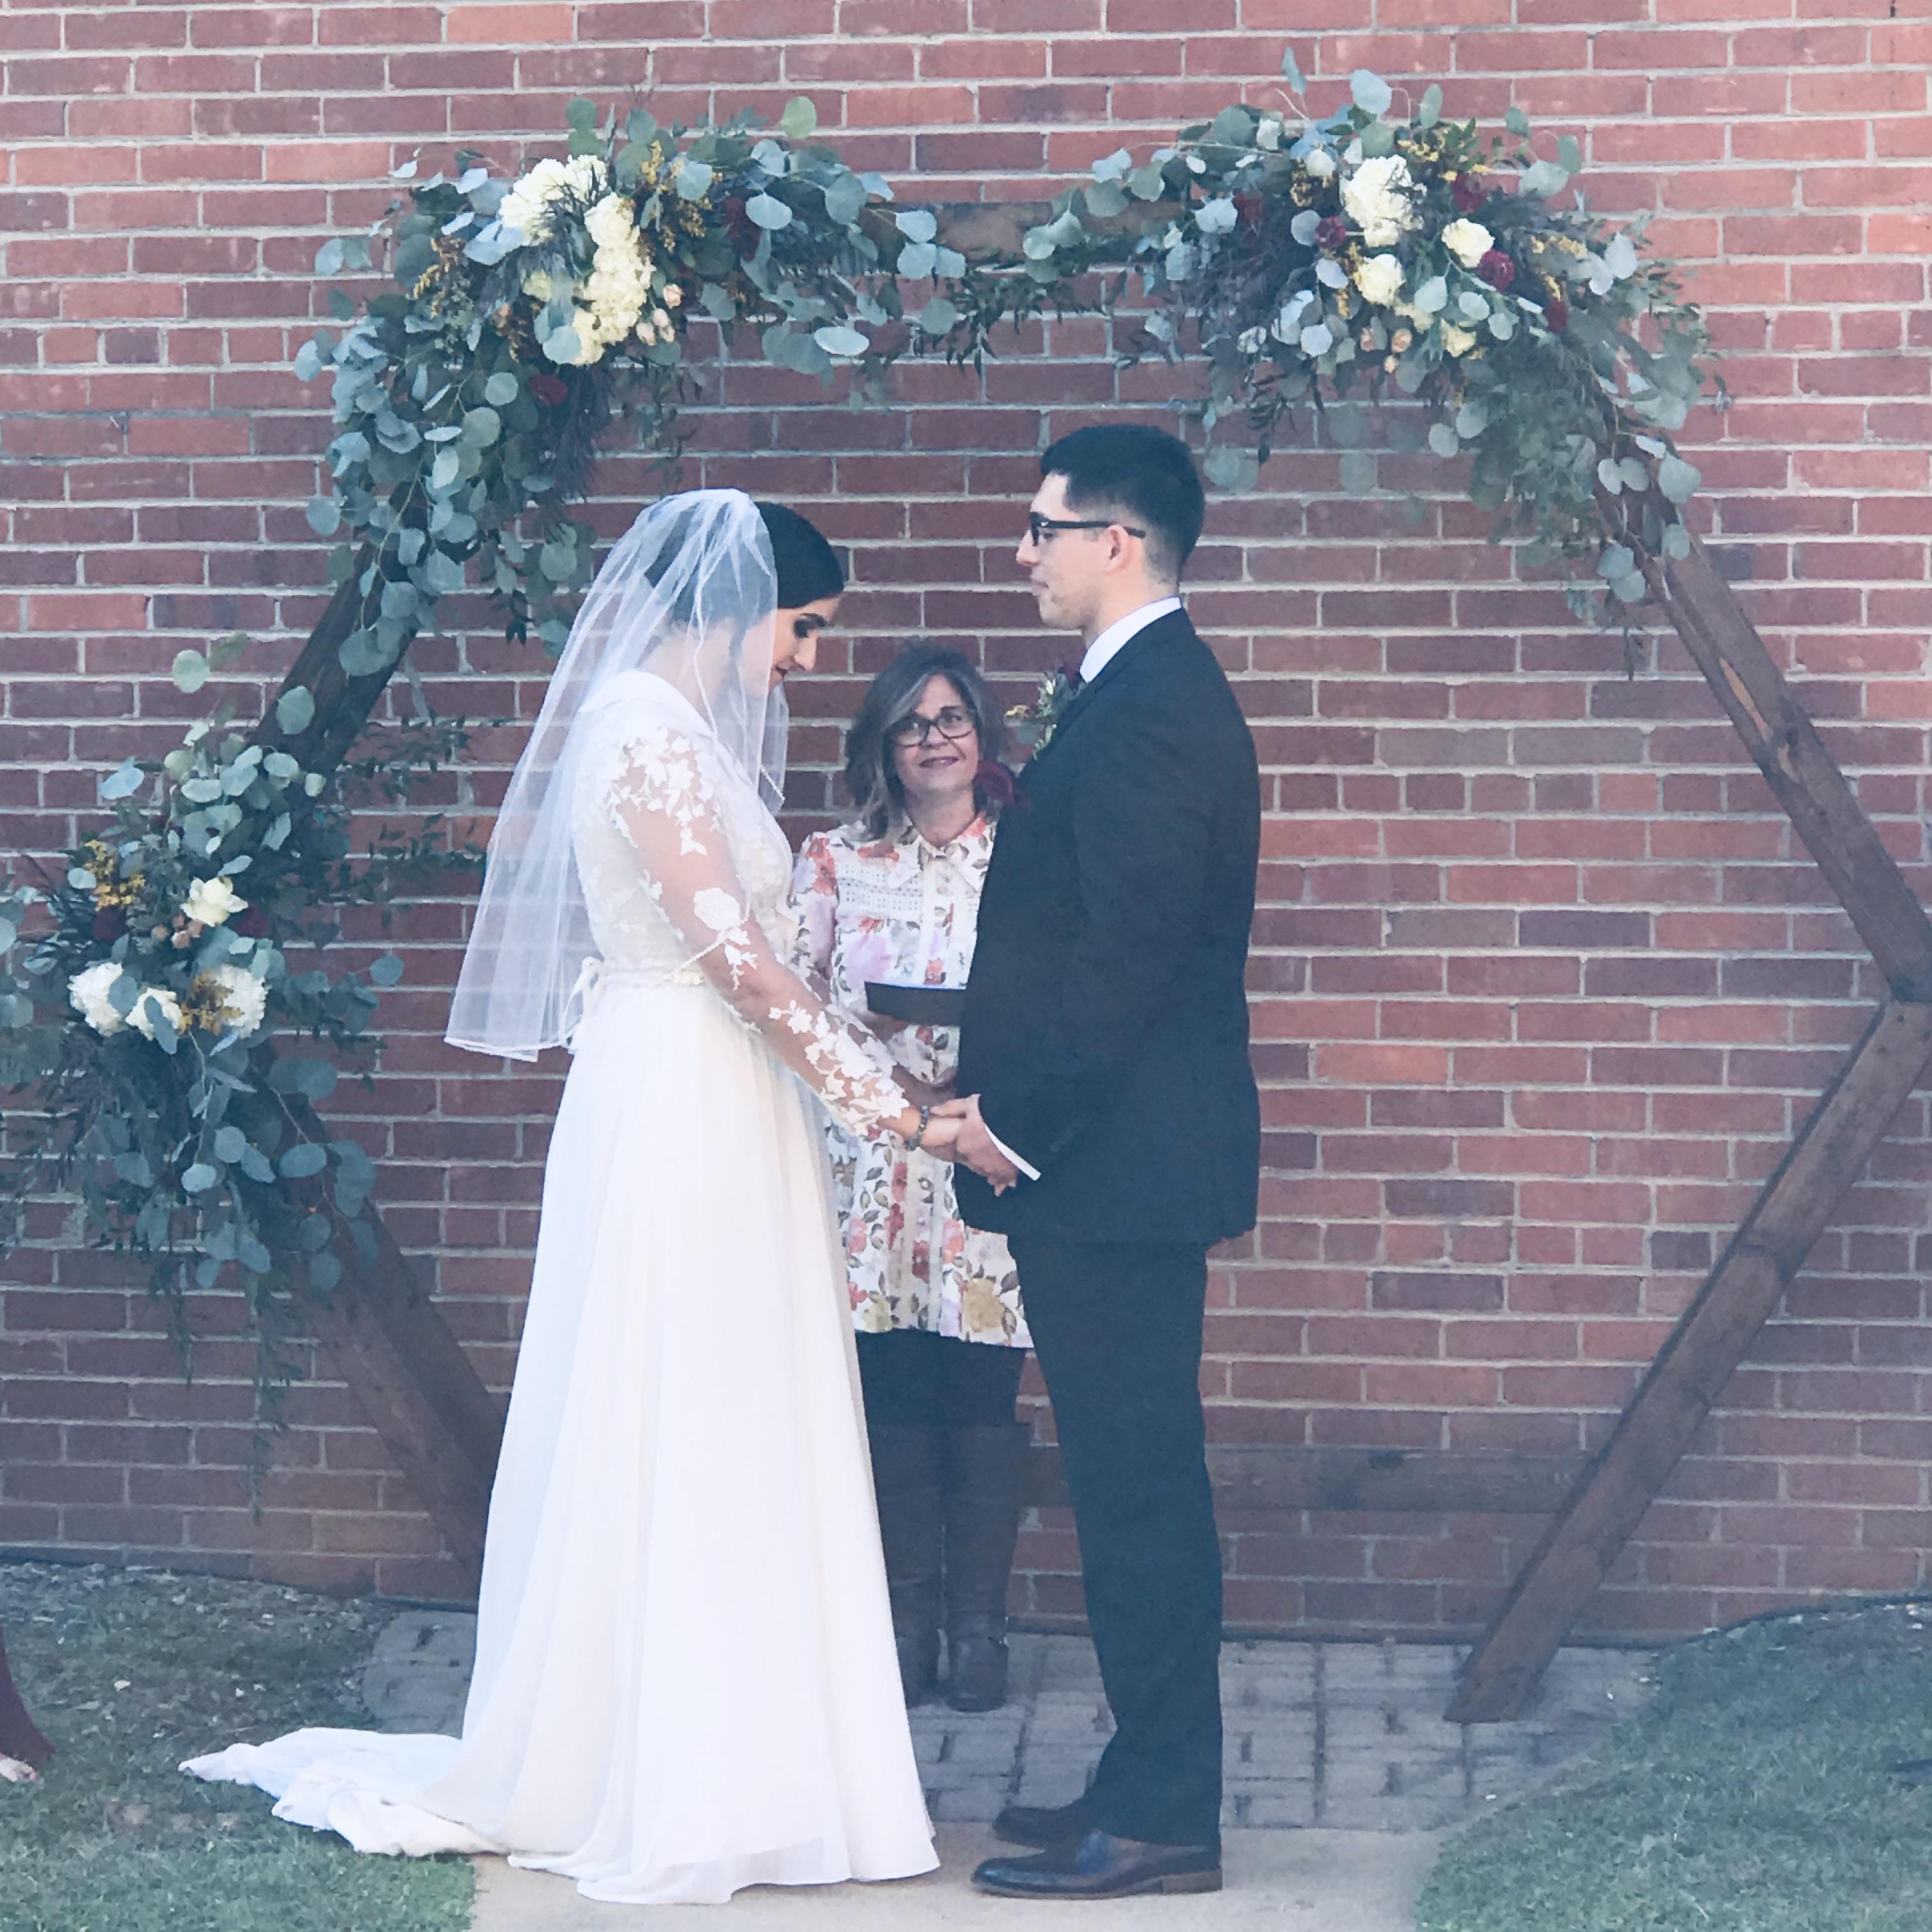 Mary & Aaron